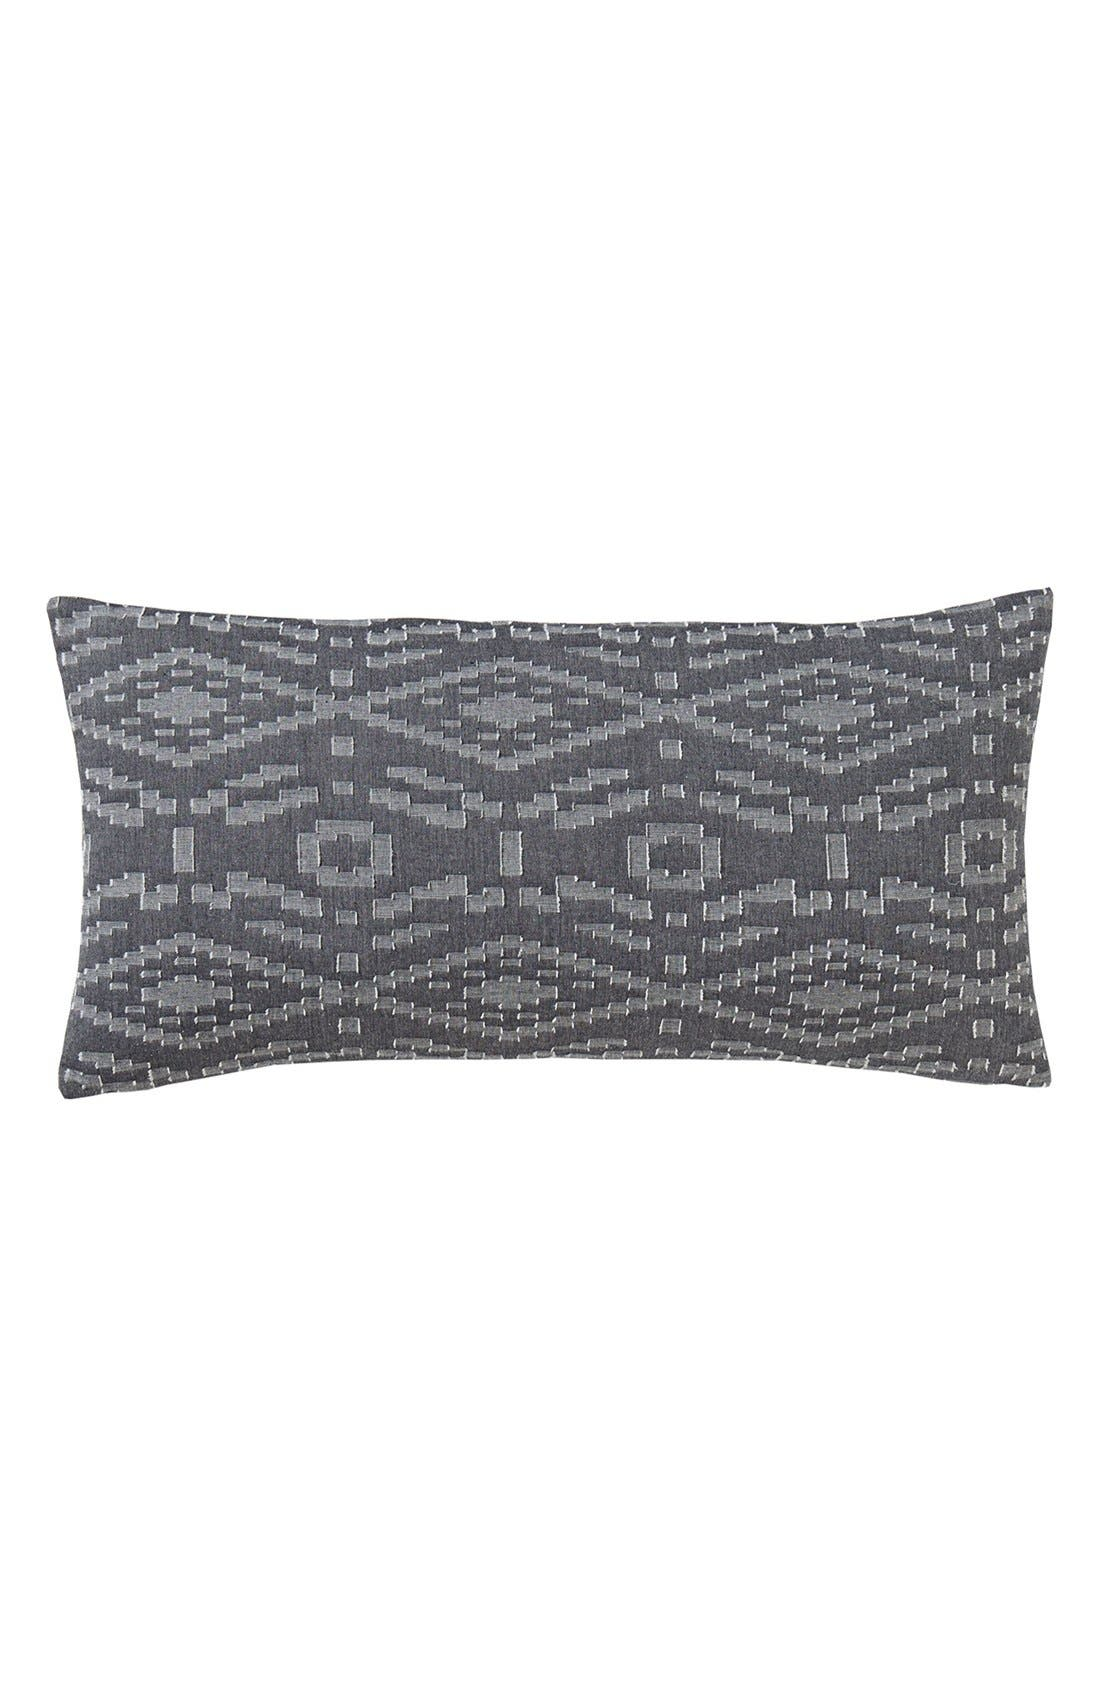 DwellStudio 'Tangier' Decorative Pillow